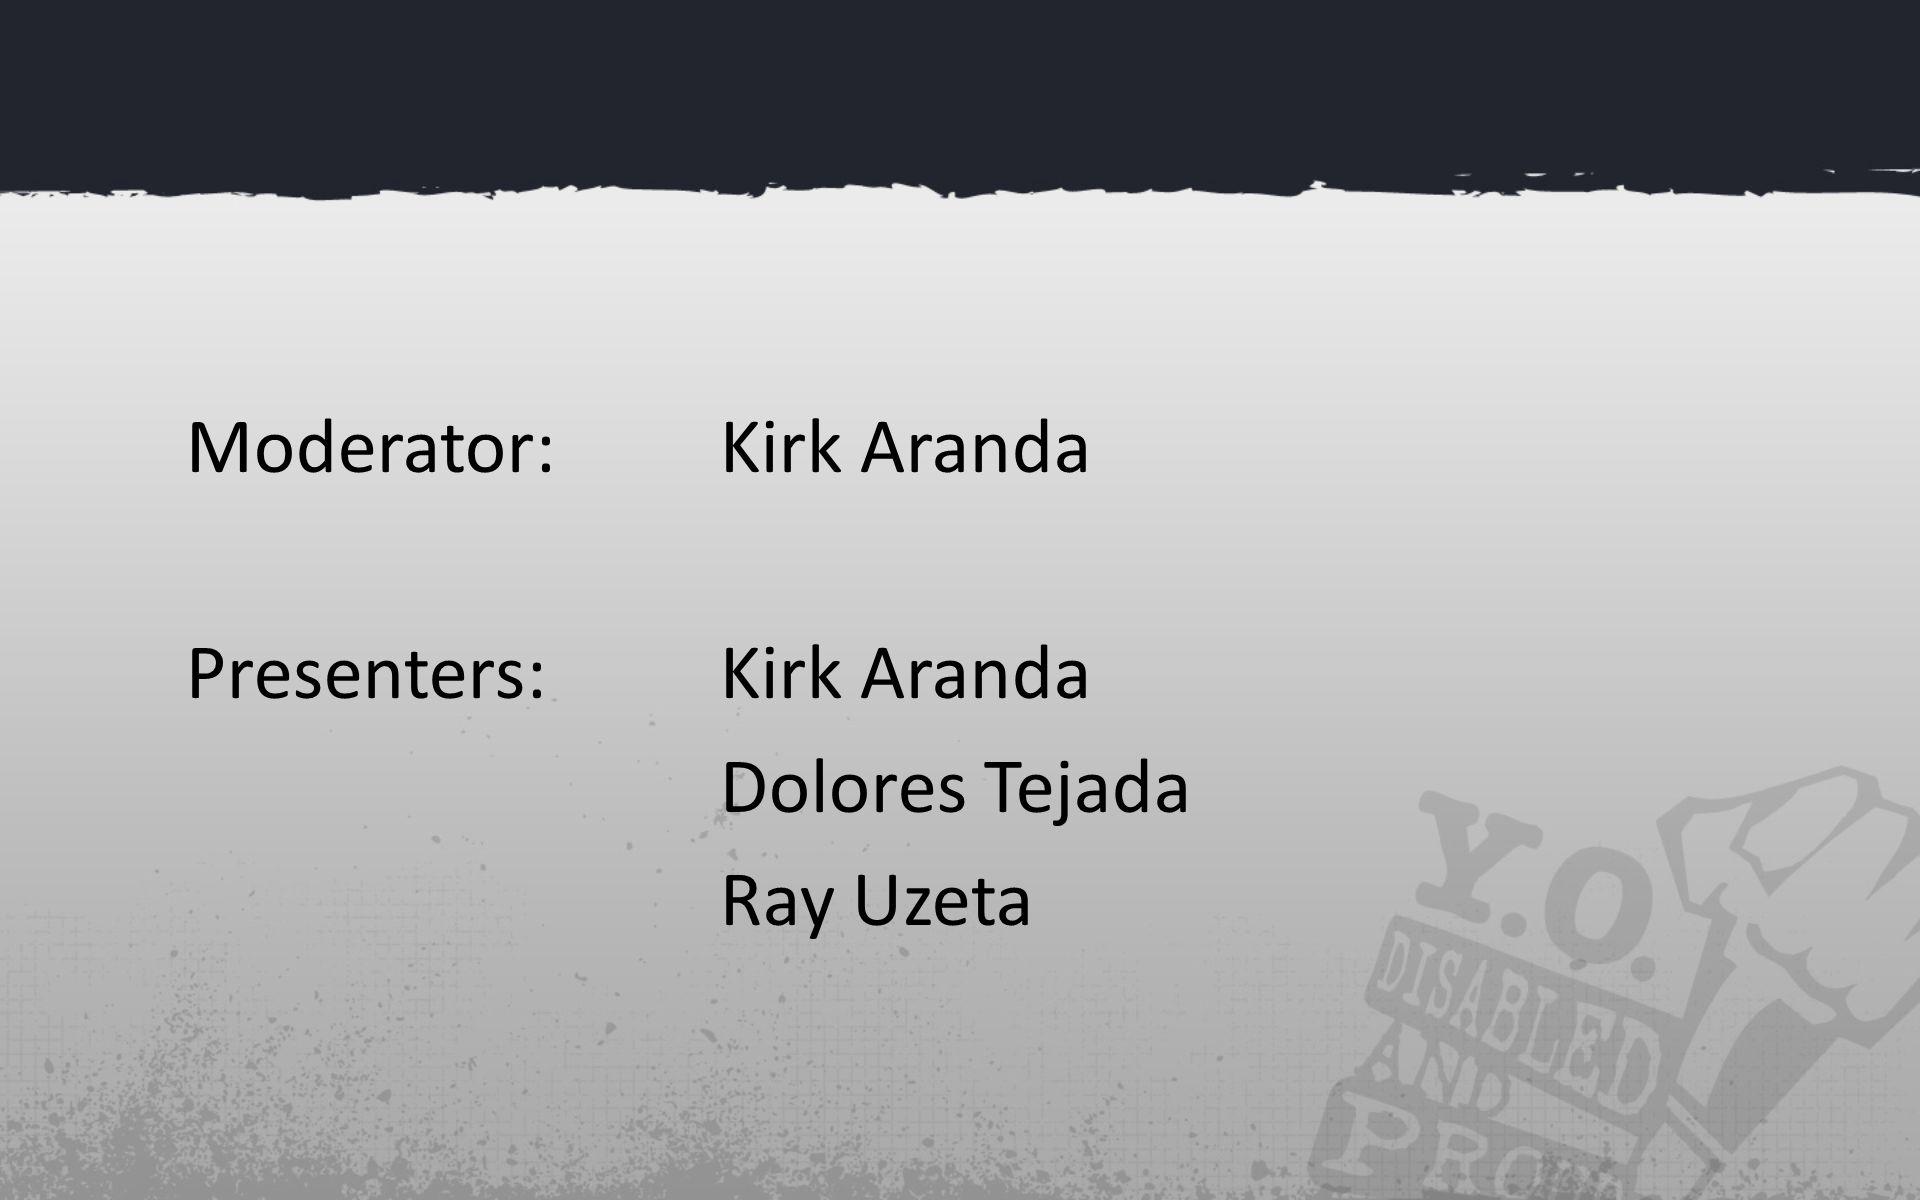 Moderator: Kirk Aranda Presenters: Kirk Aranda Dolores Tejada Ray Uzeta